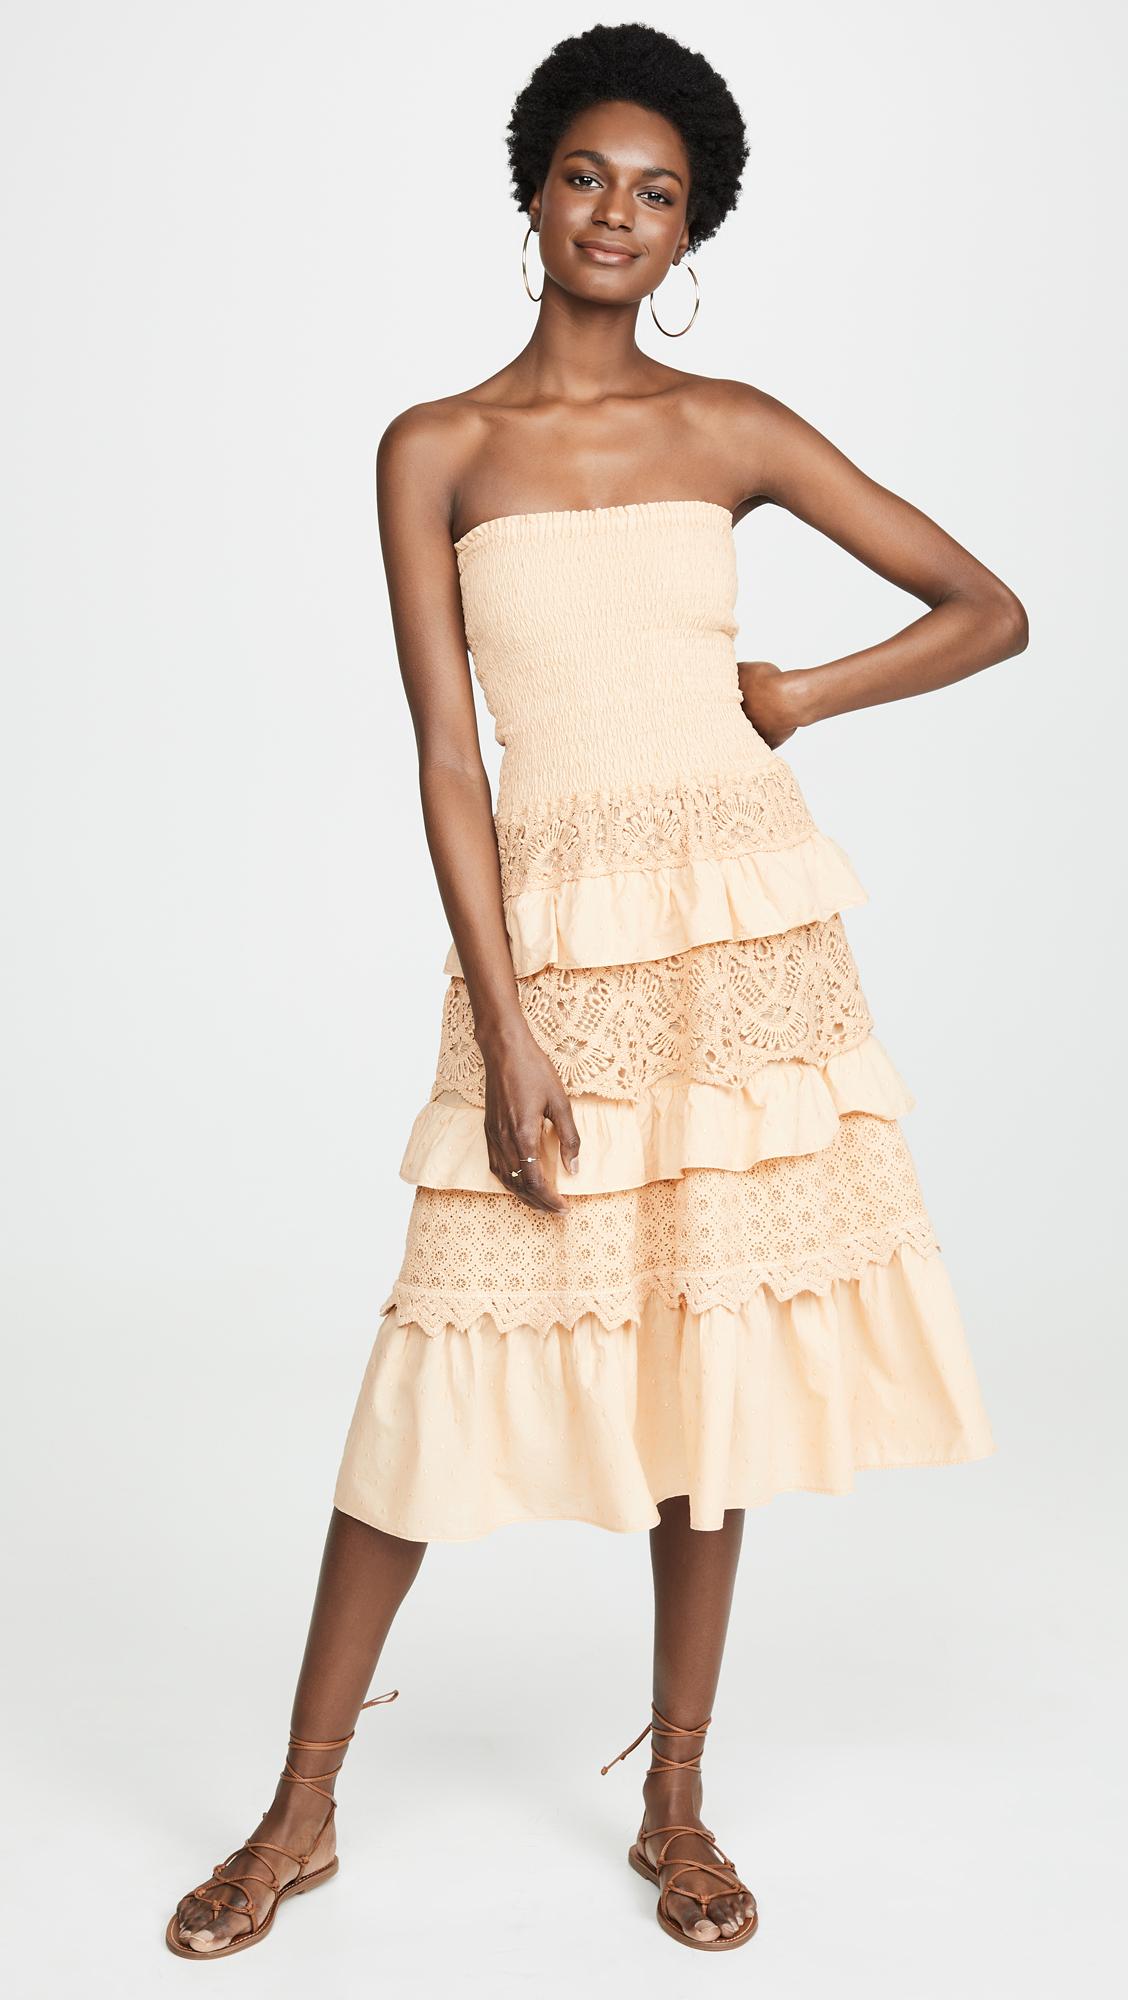 Temptation Positano Verona Tiered Strapless Midi Dress